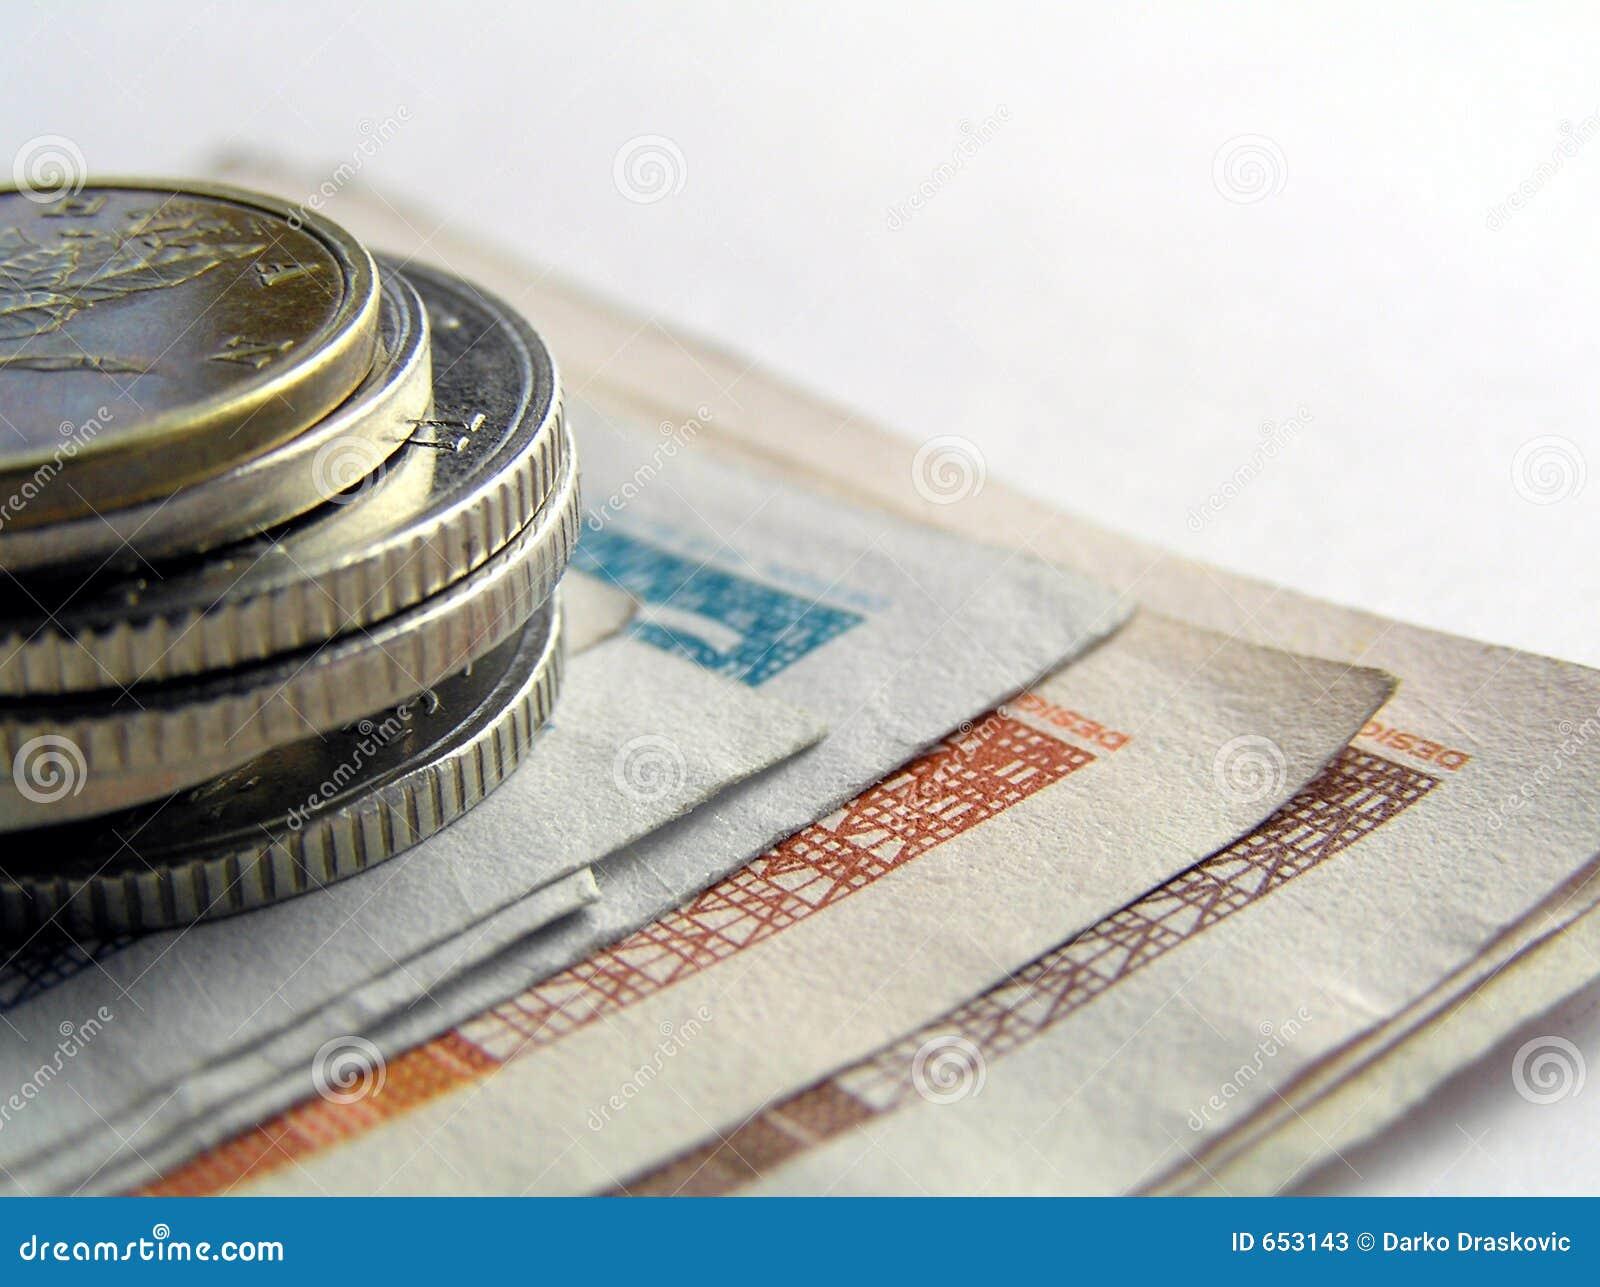 Croatian money 11